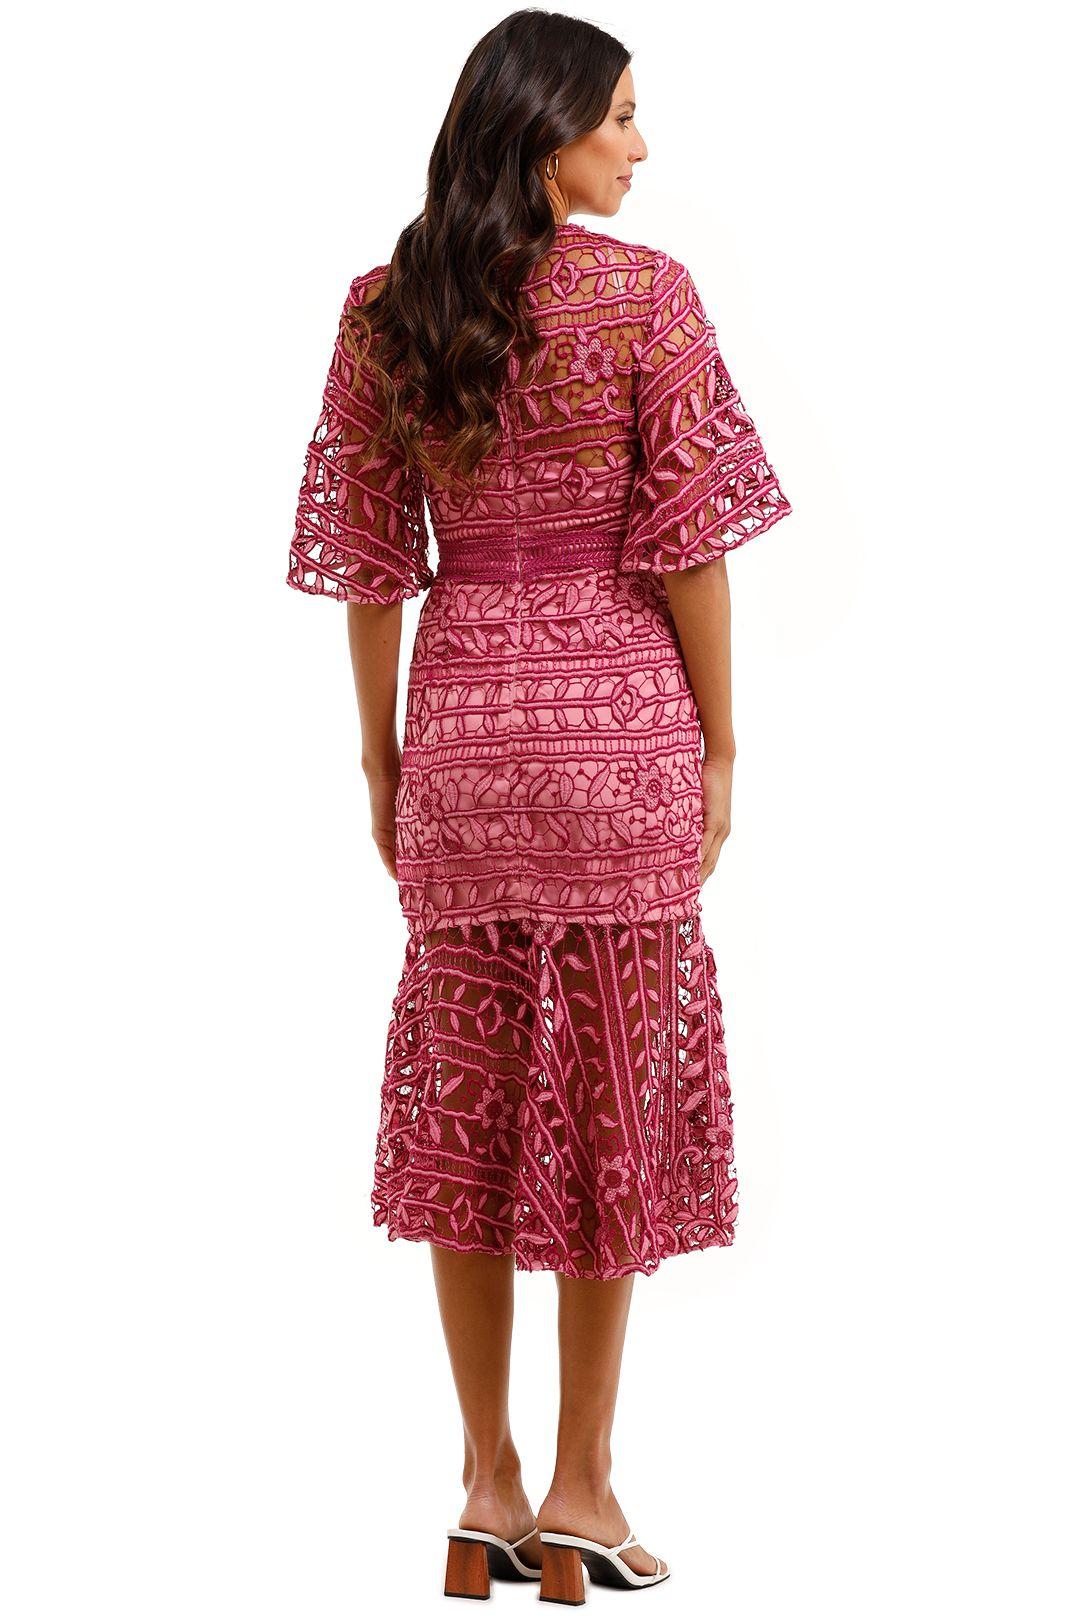 Talulah Caprice Midi Dress Pink Multi Fit and Flare